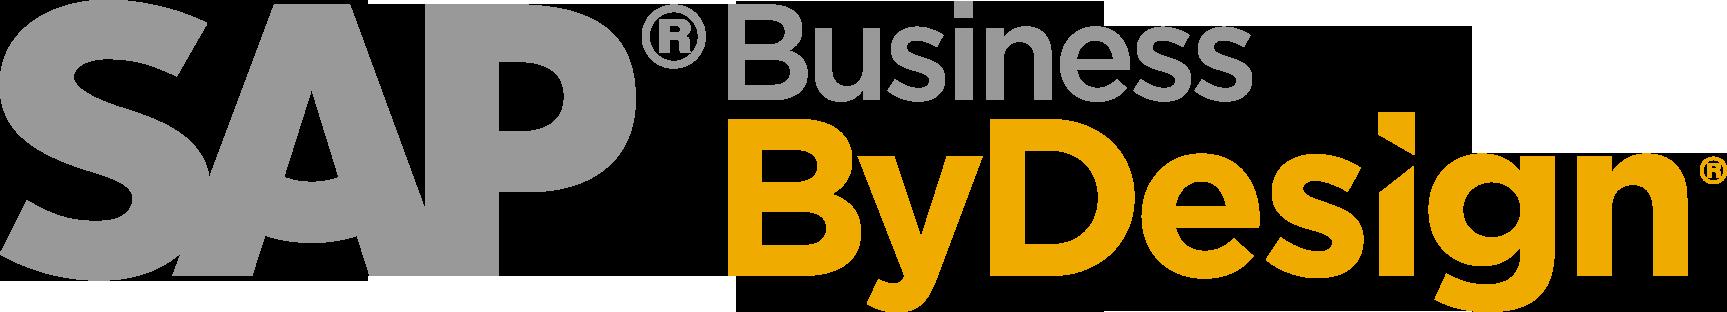 SAP BUSINESS BYDESIGN-1